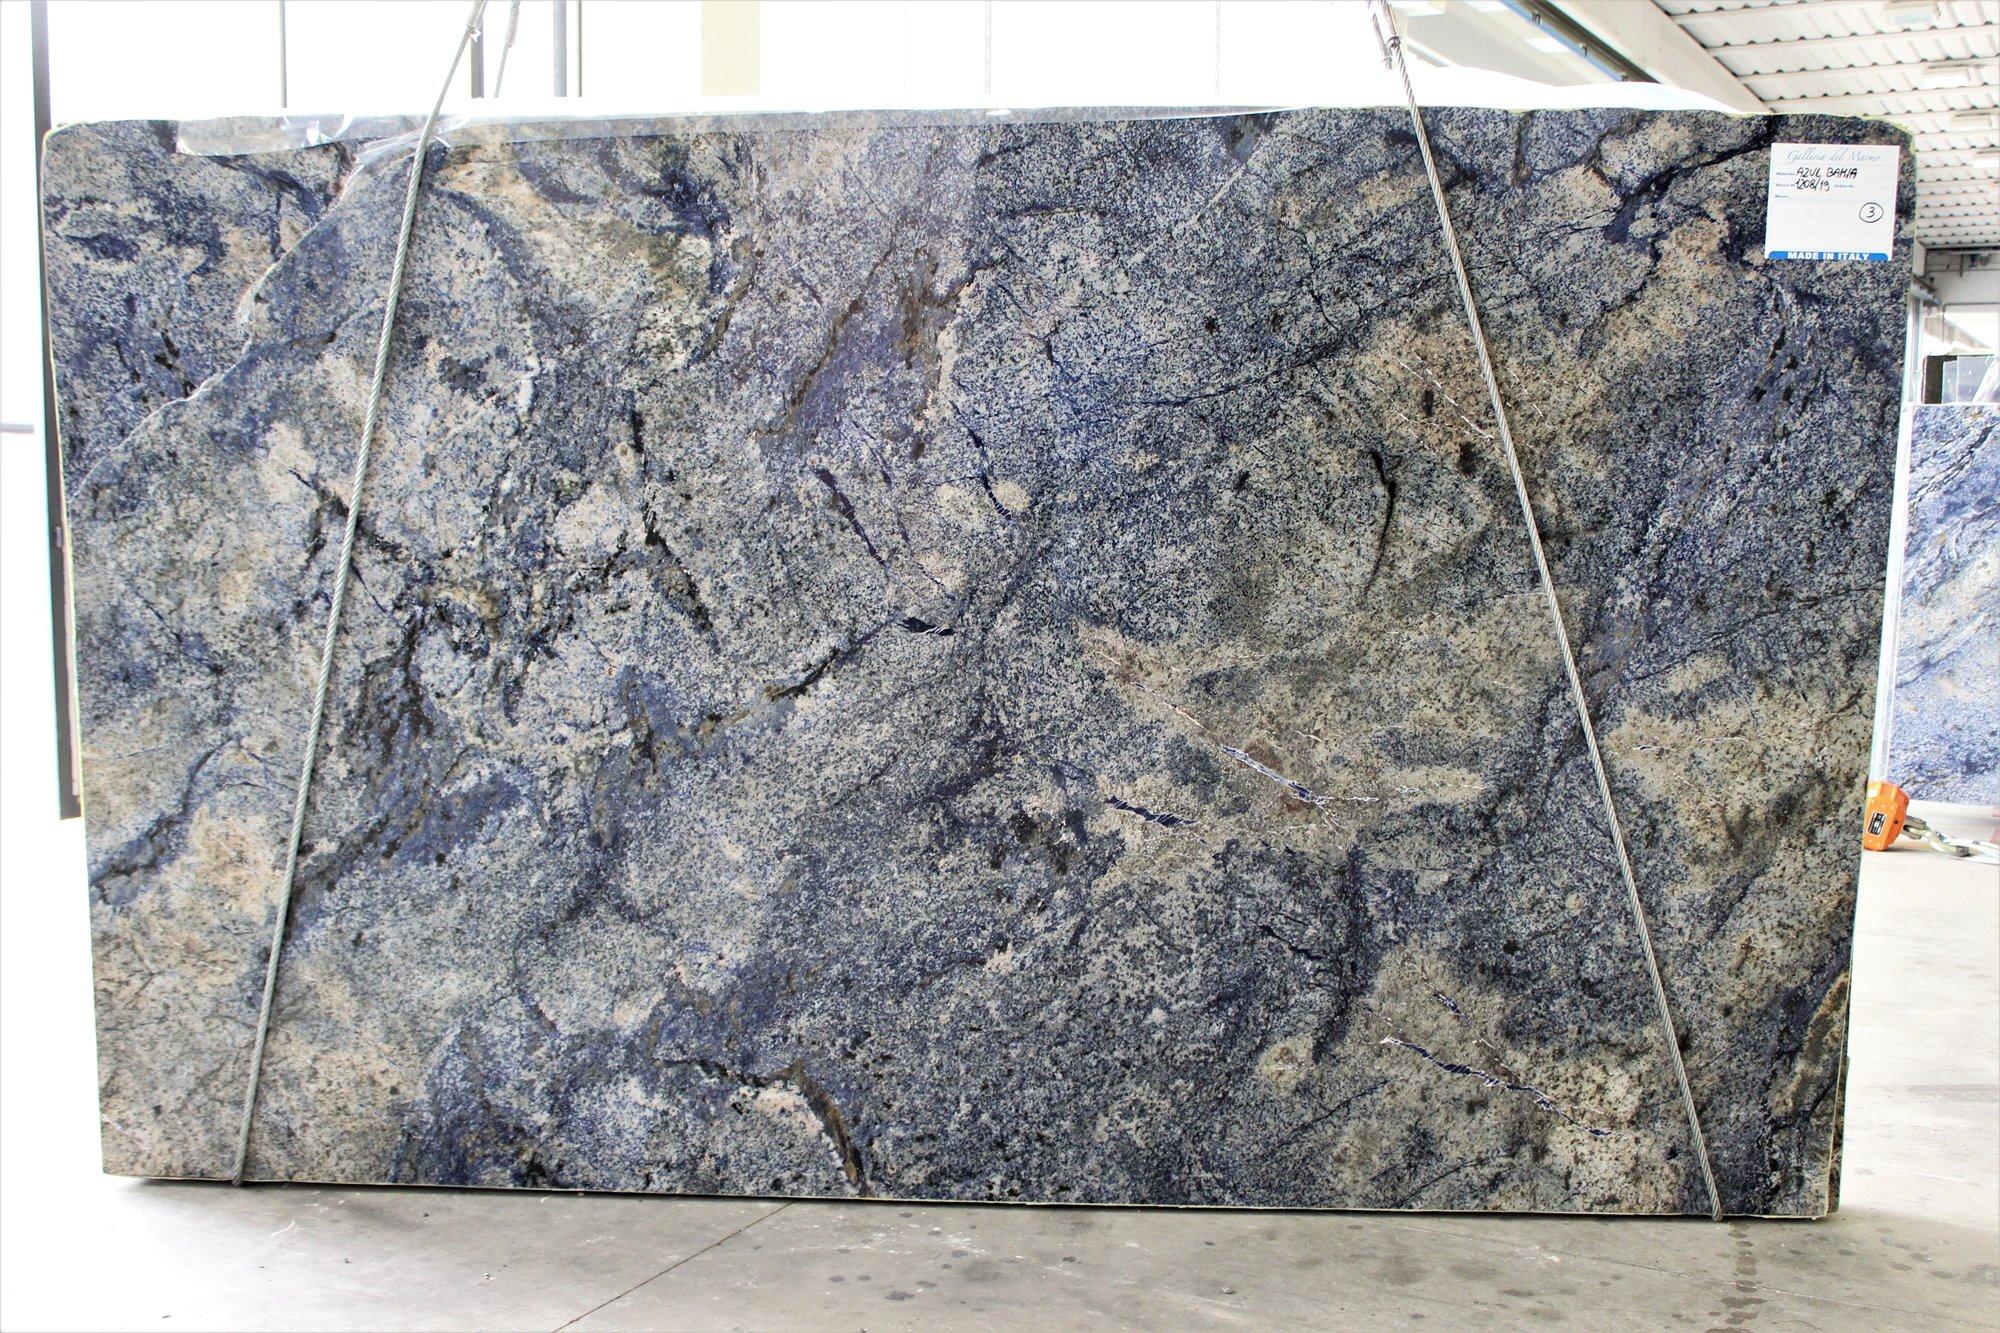 Nero D Africa Marmo galleria del marmo   solfagroup   bring stone to life!